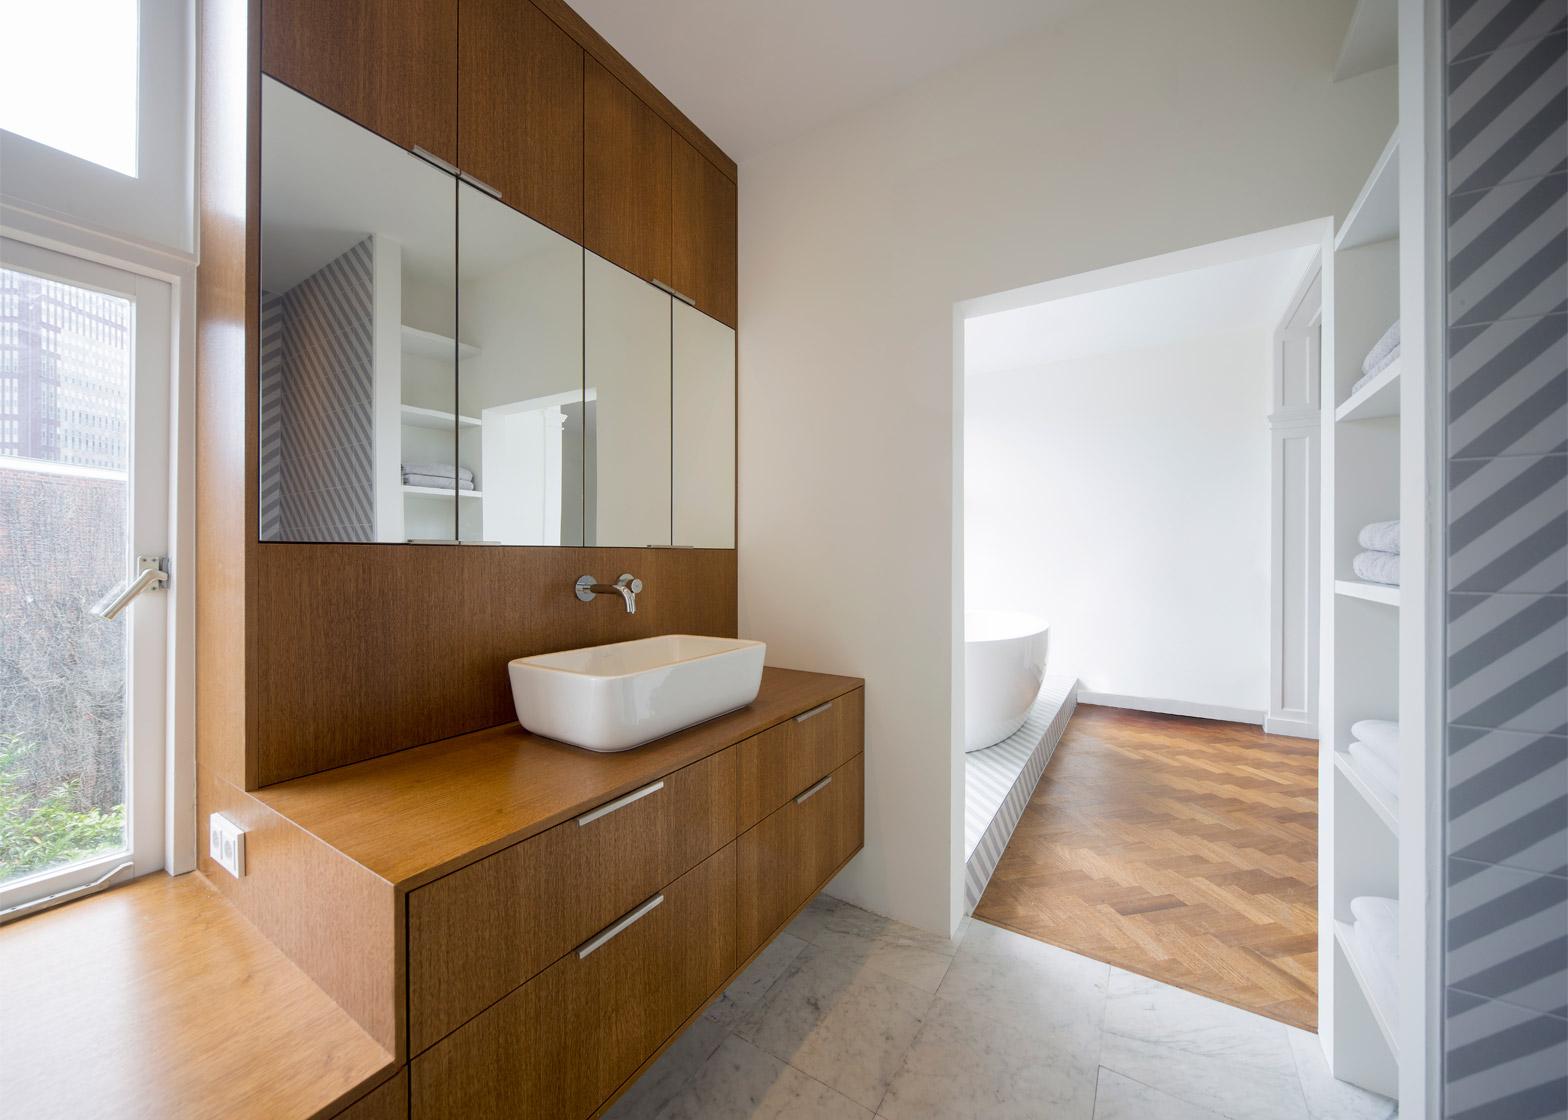 architecture_renovation_project_hague-interior_house__design_studia_interiors_osnovadesign_osnova_poltava_03